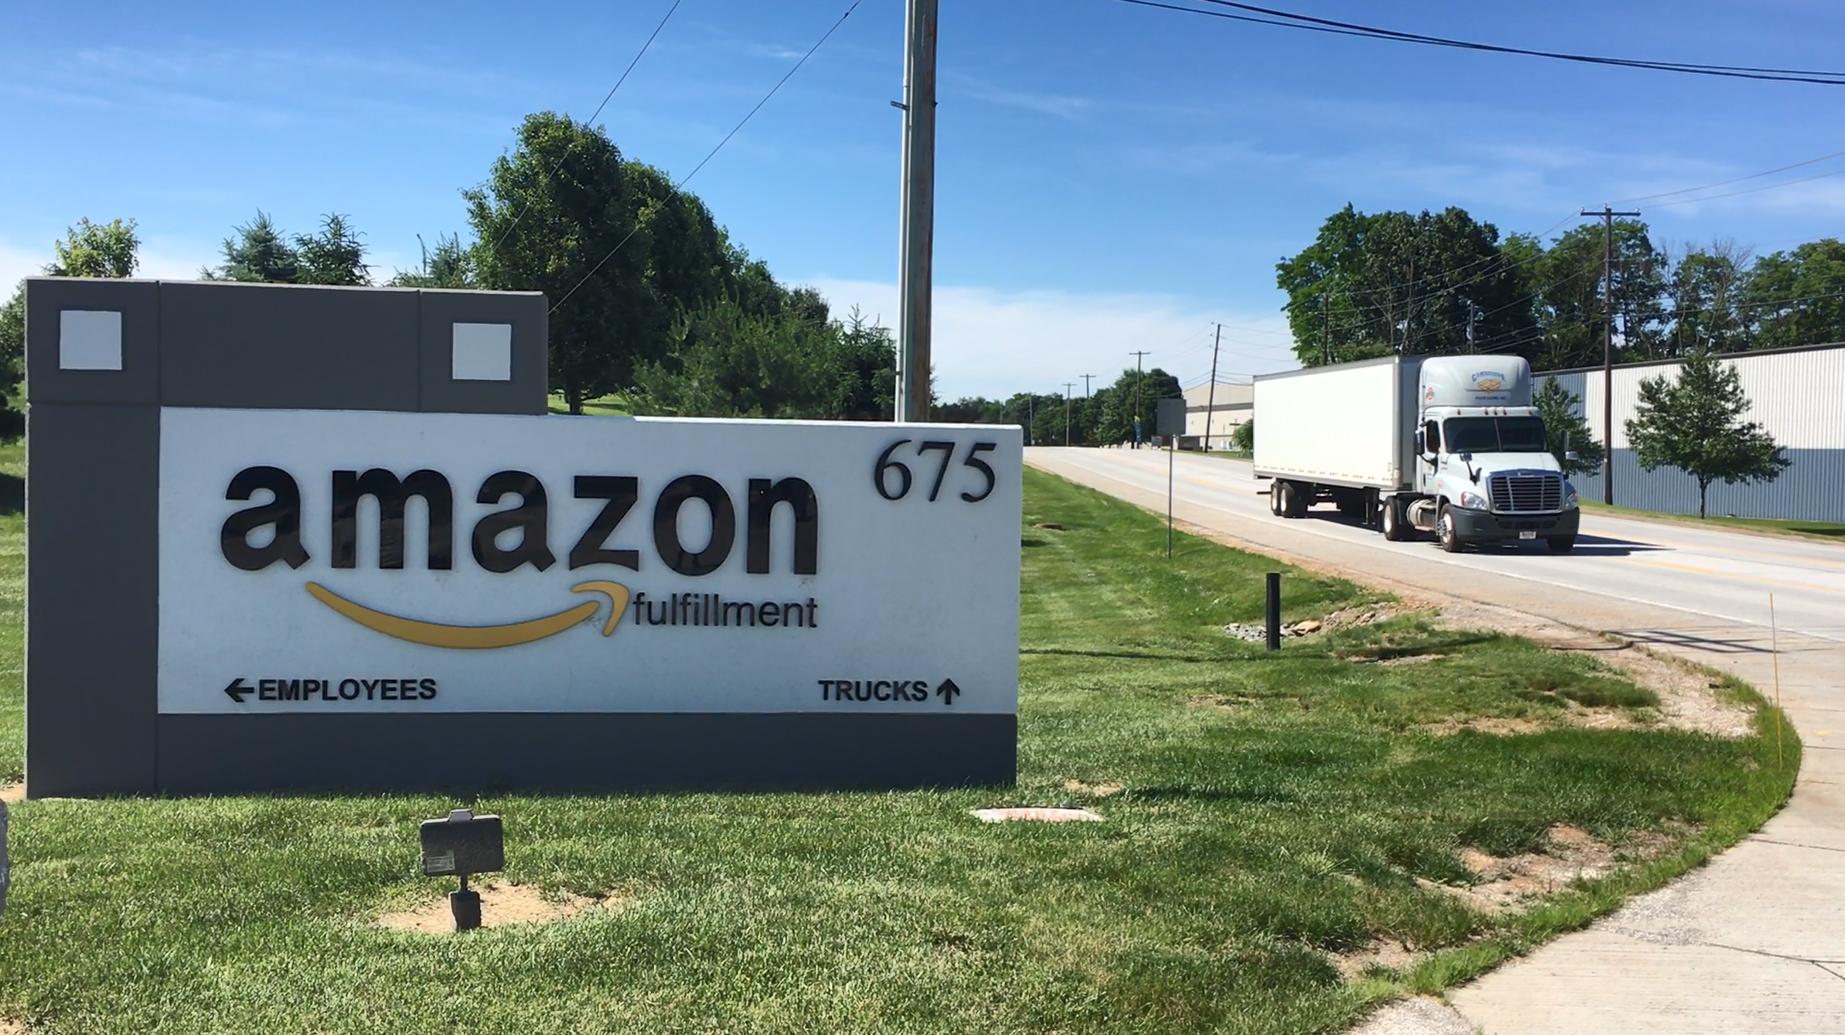 Amazon fulfillment center on Allen Road, Carlisle